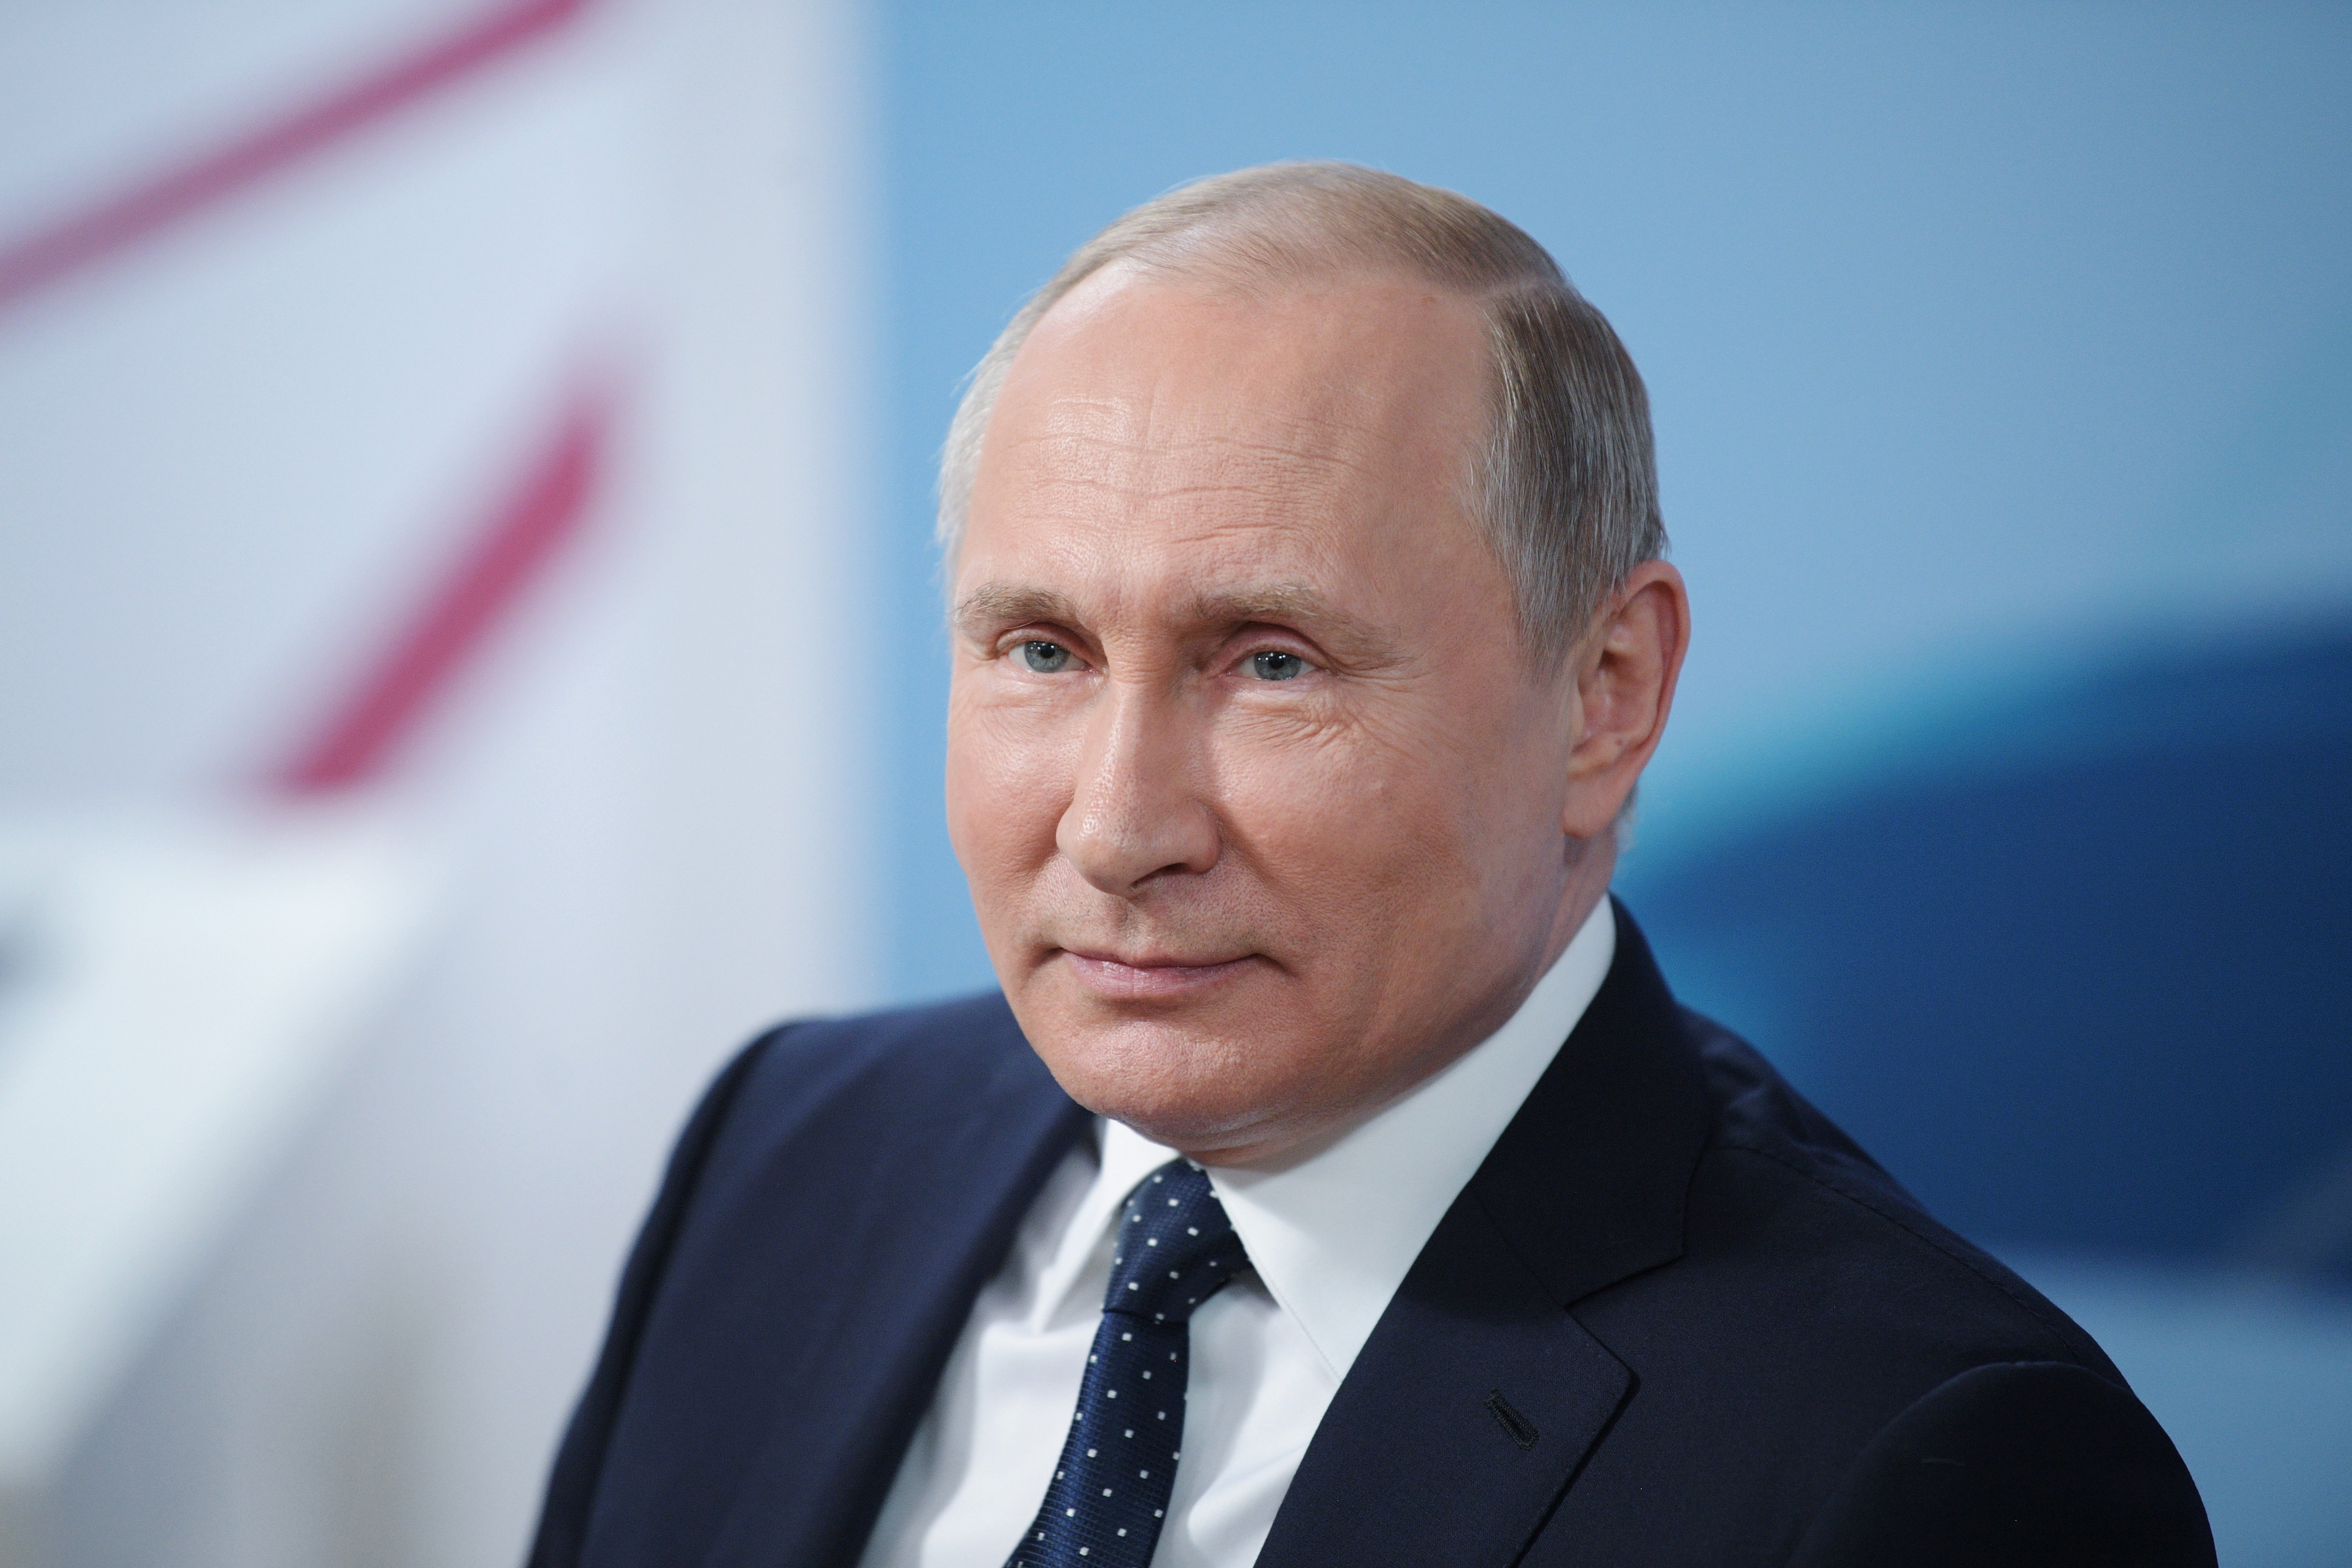 <p>Фото: &copy; РИА Новости/ Алексей Дружинин</p>